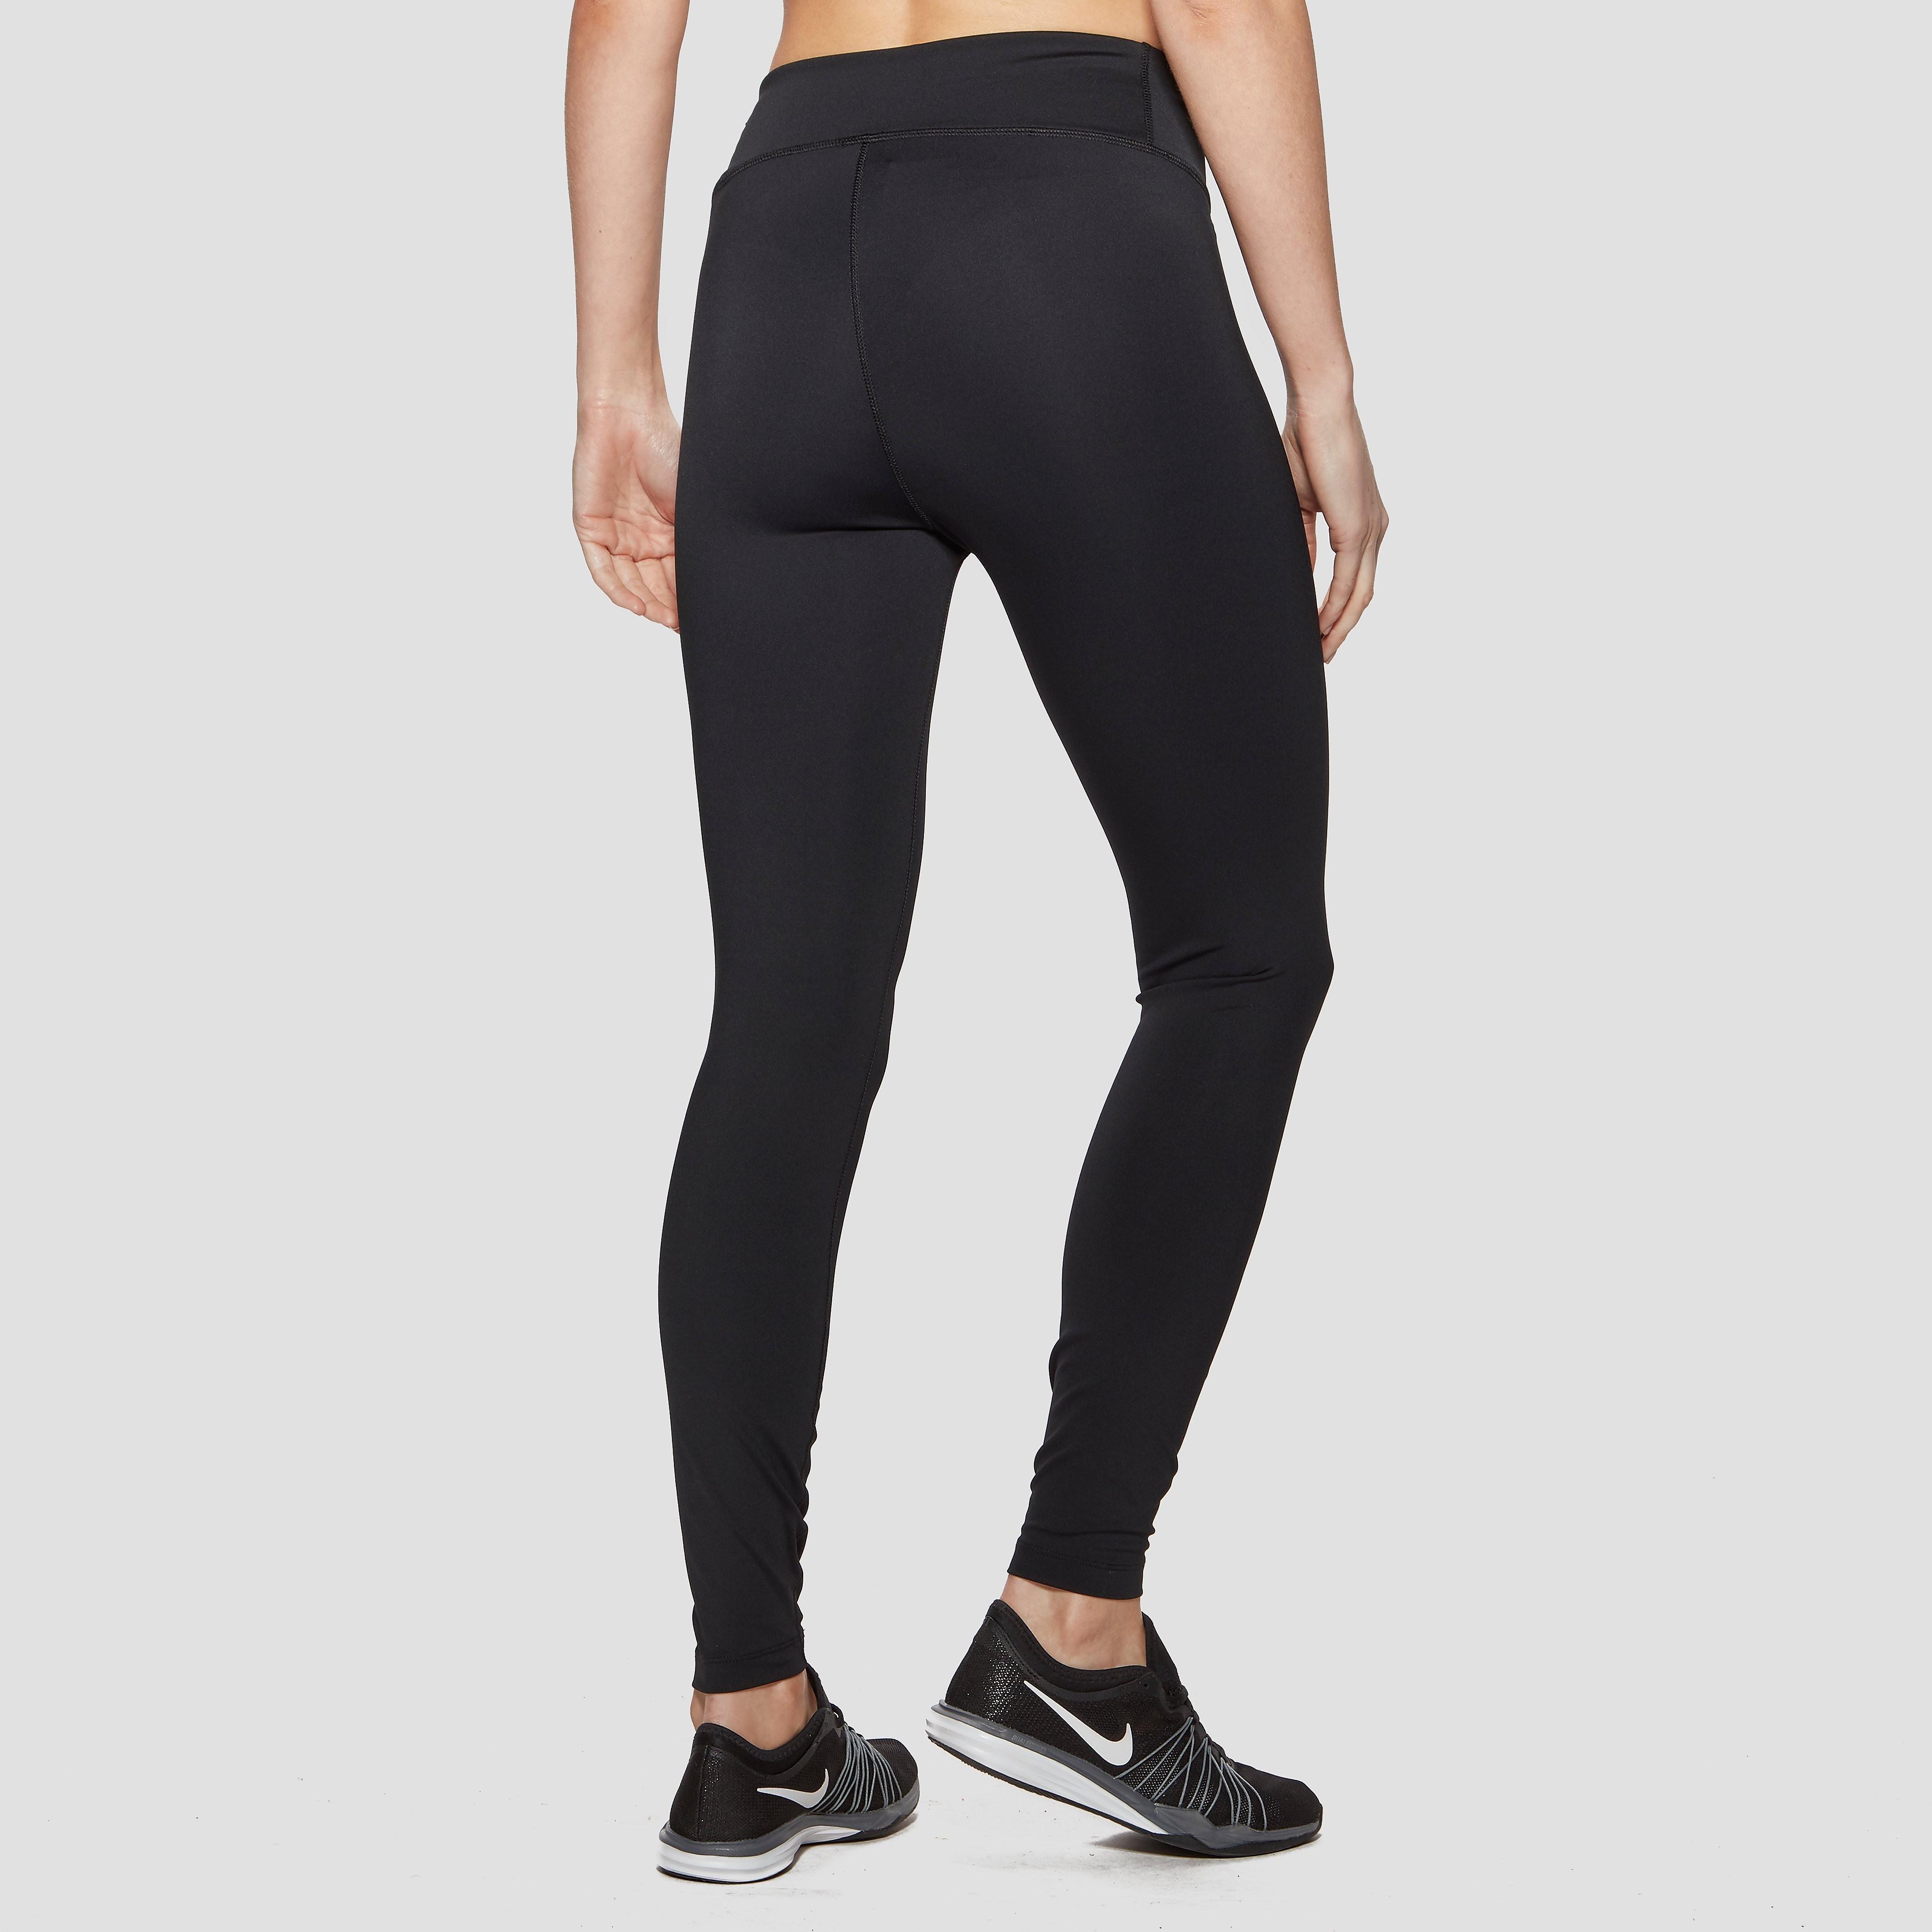 Nike Women's Power Tights